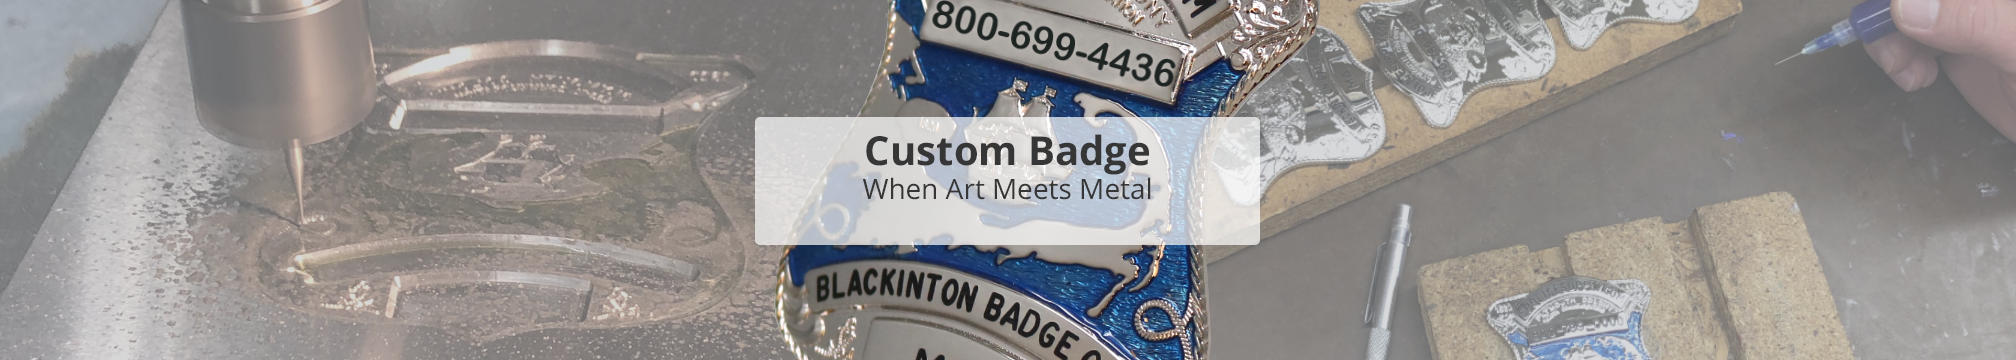 Custom Badge